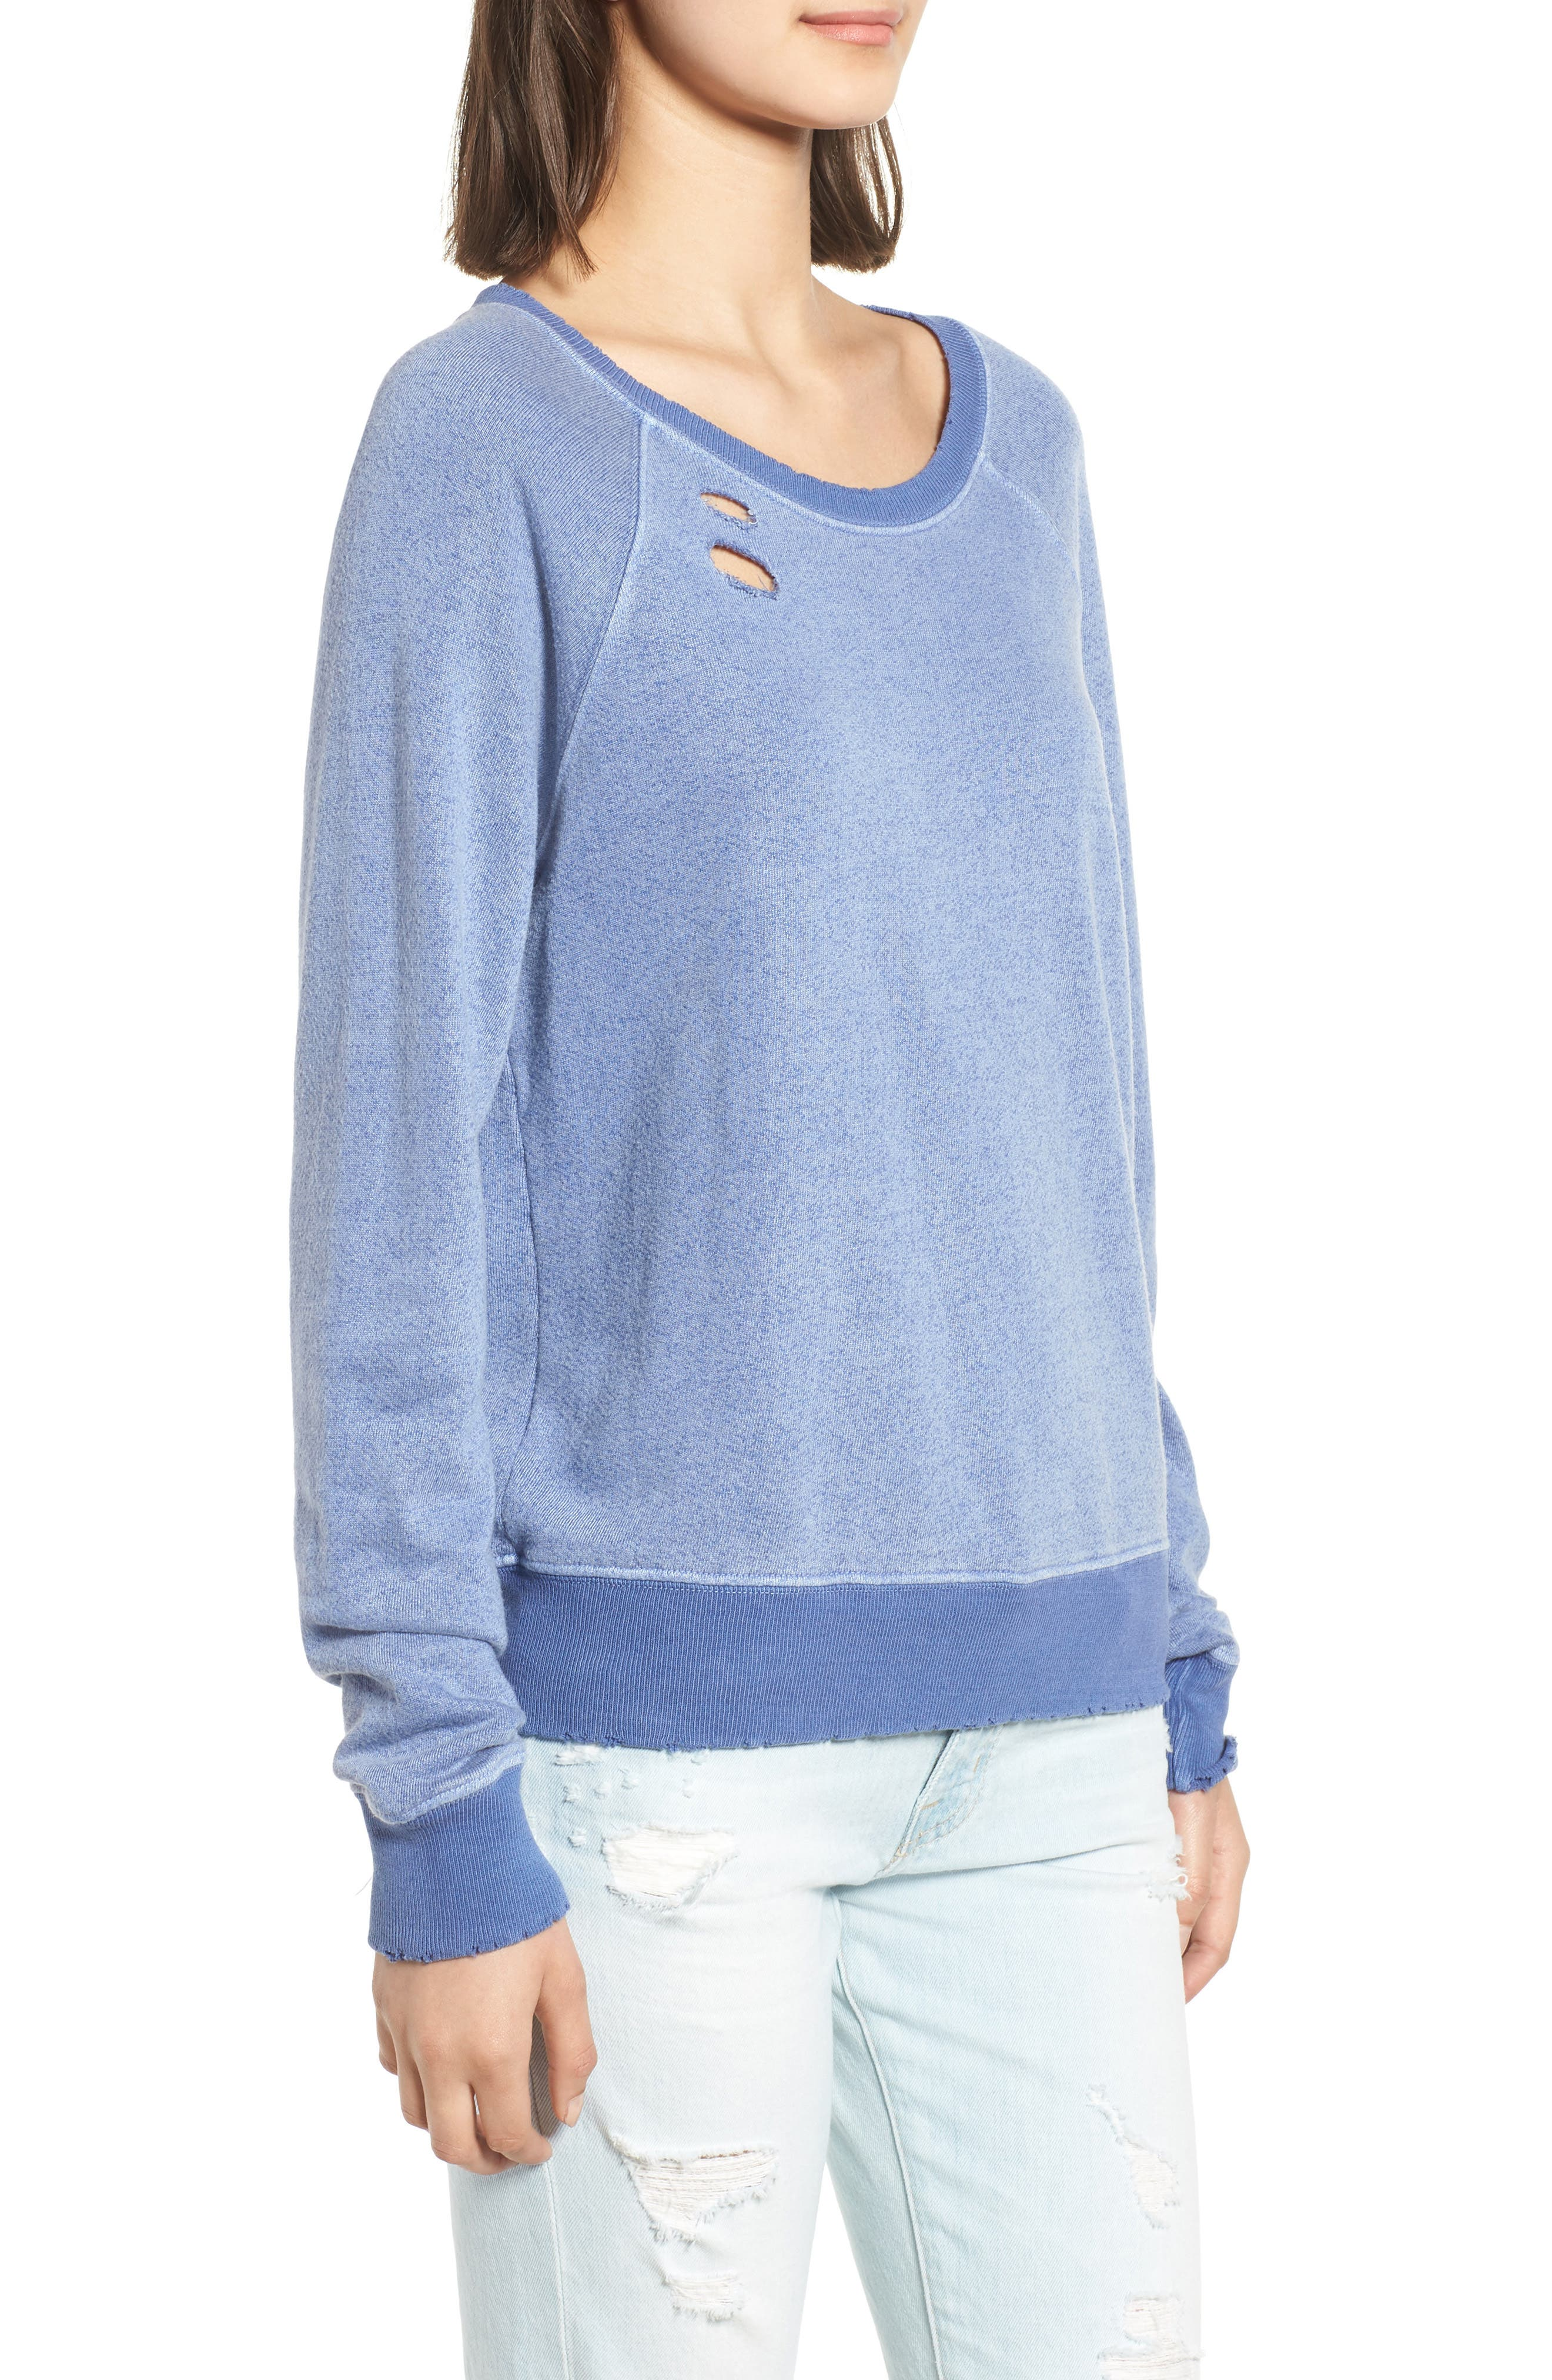 Belize Deconstructed Sweatshirt,                             Alternate thumbnail 3, color,                             COBALT